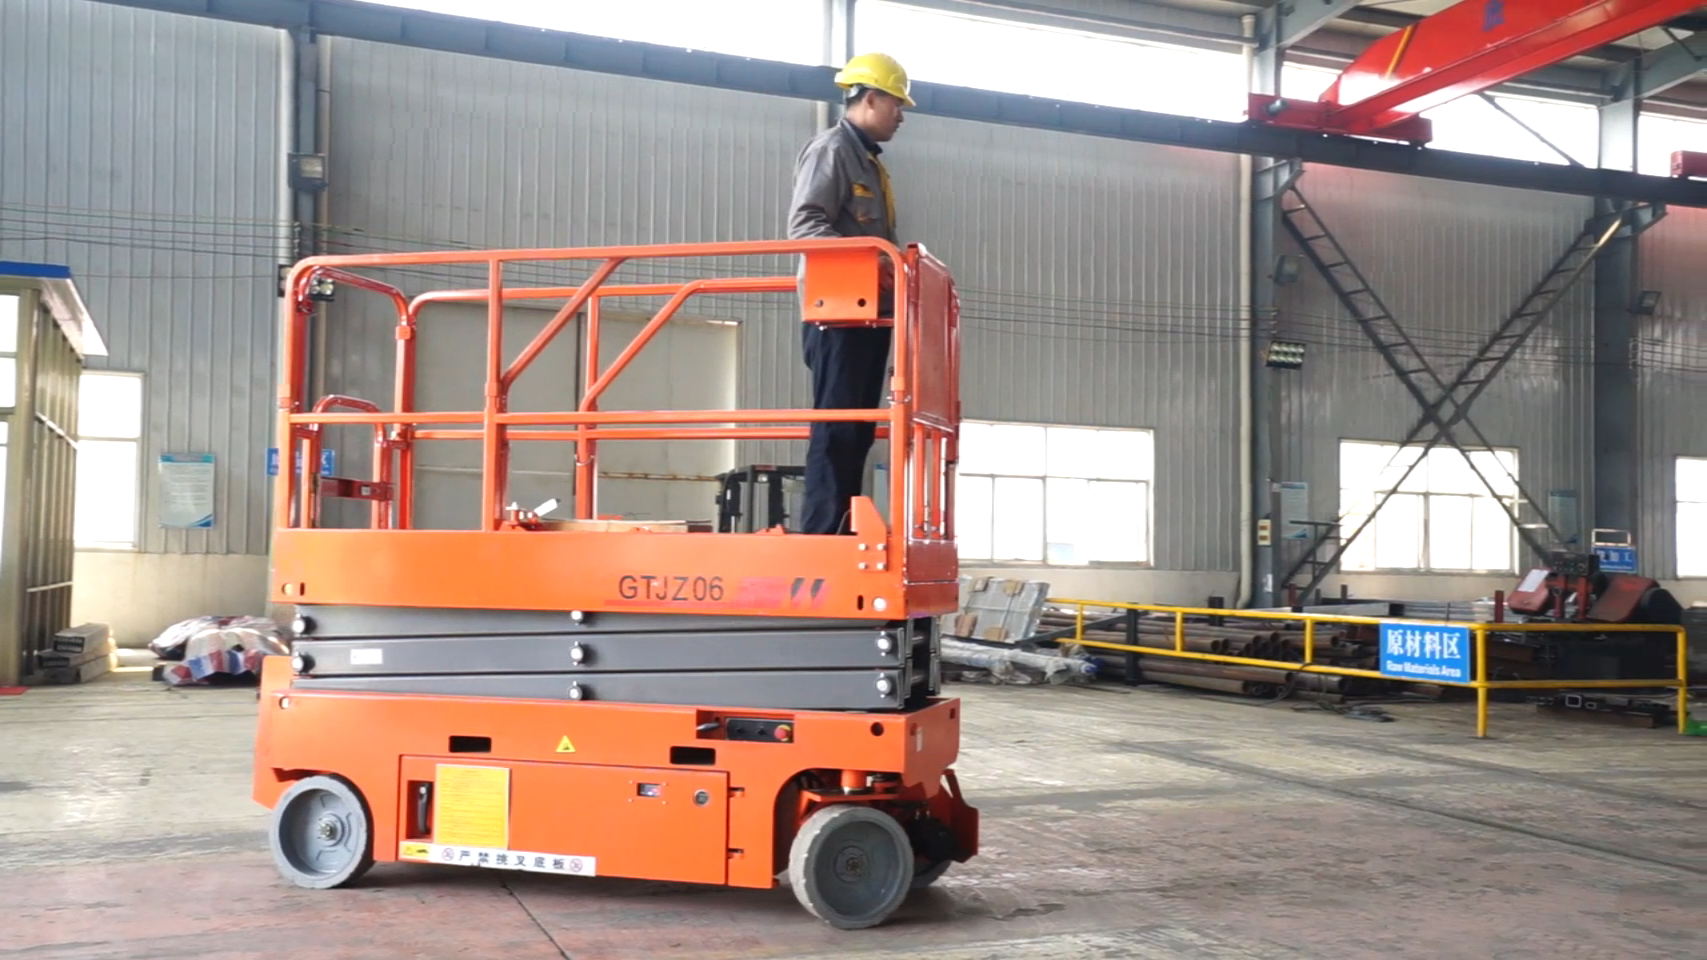 Auto Scissor Lift 12m Self propelled Scissor Lift hydraulic lift machine